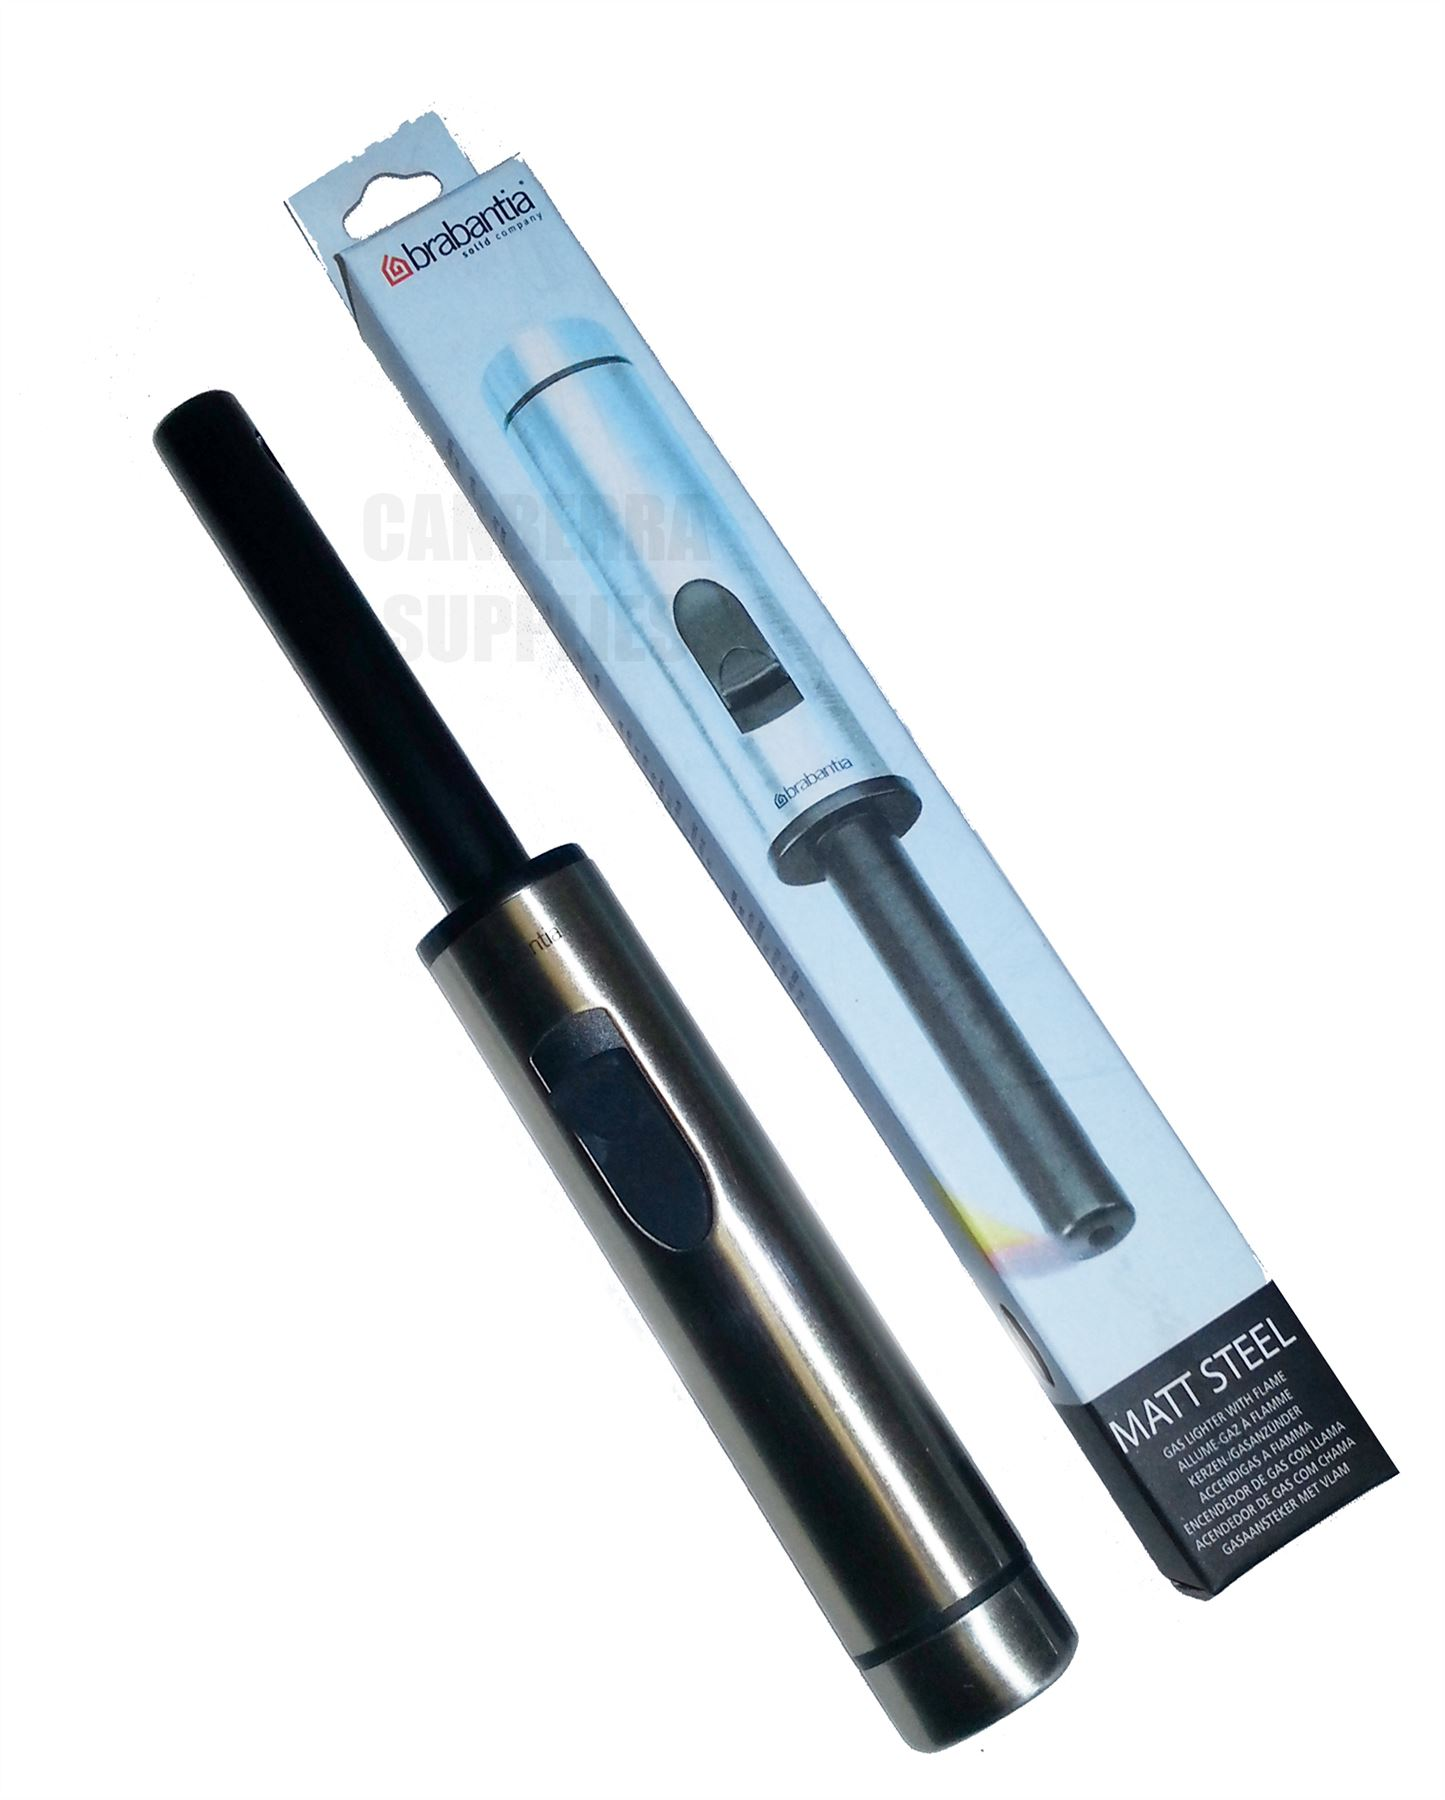 brabantia gas lighter instructions